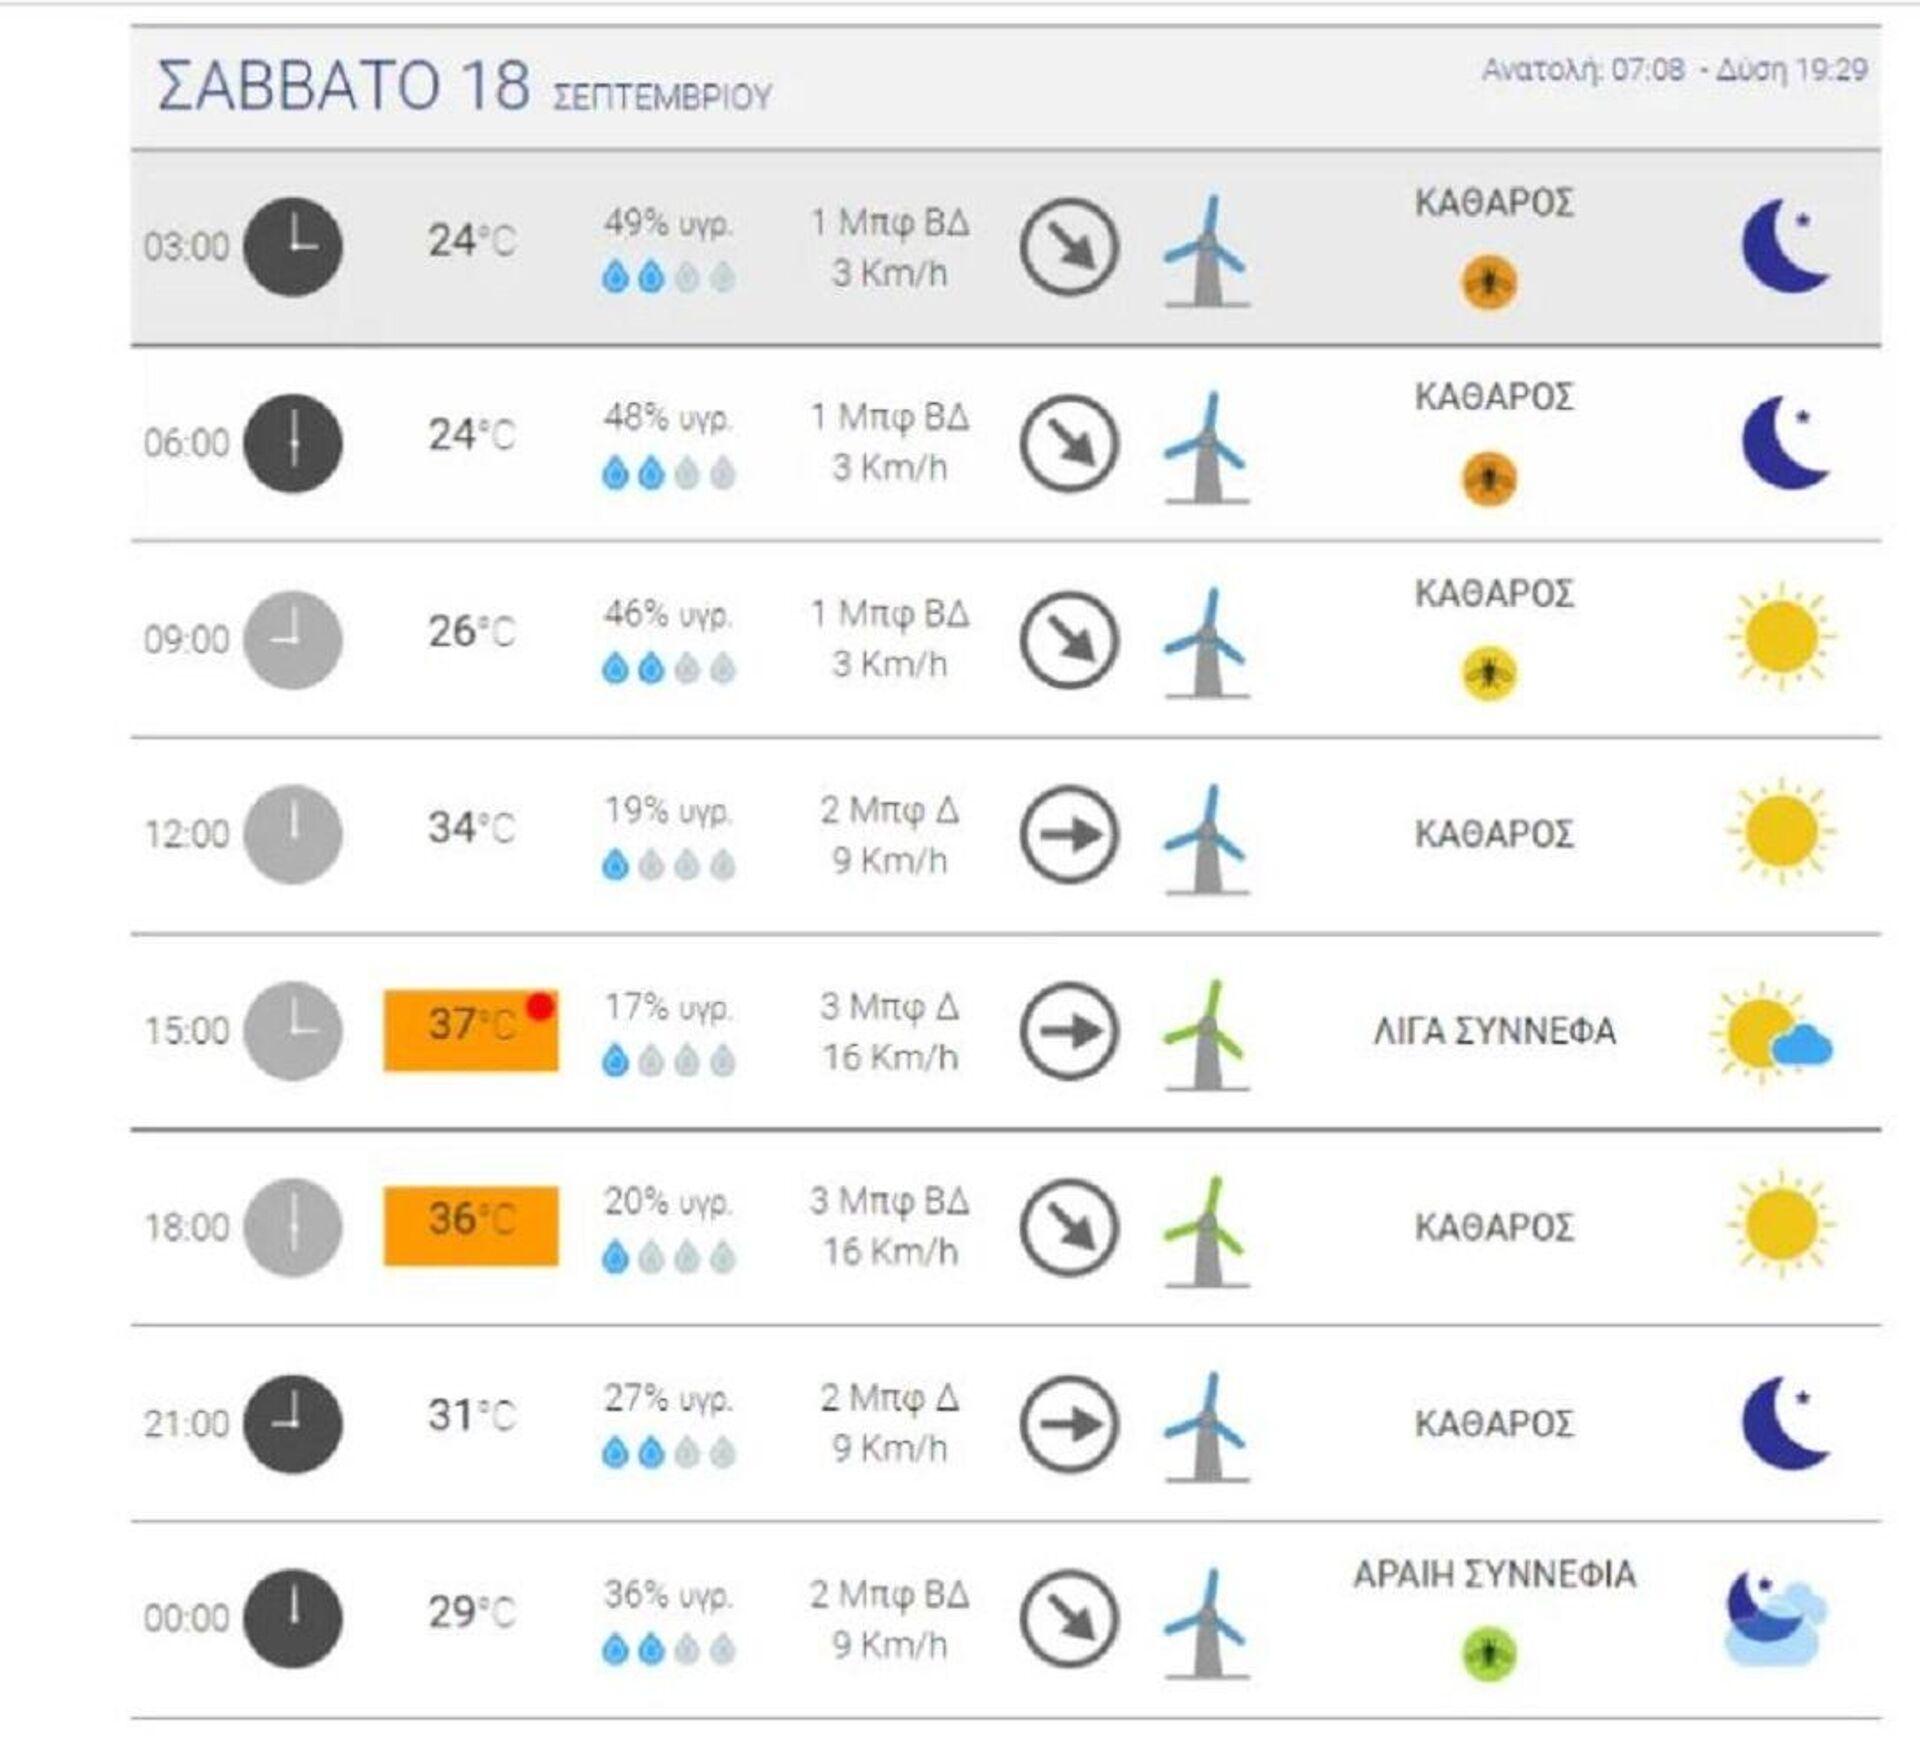 Xάρτης με τις θερμοκρασίες του Σαββάτου (18/09) - Sputnik Ελλάδα, 1920, 16.09.2021